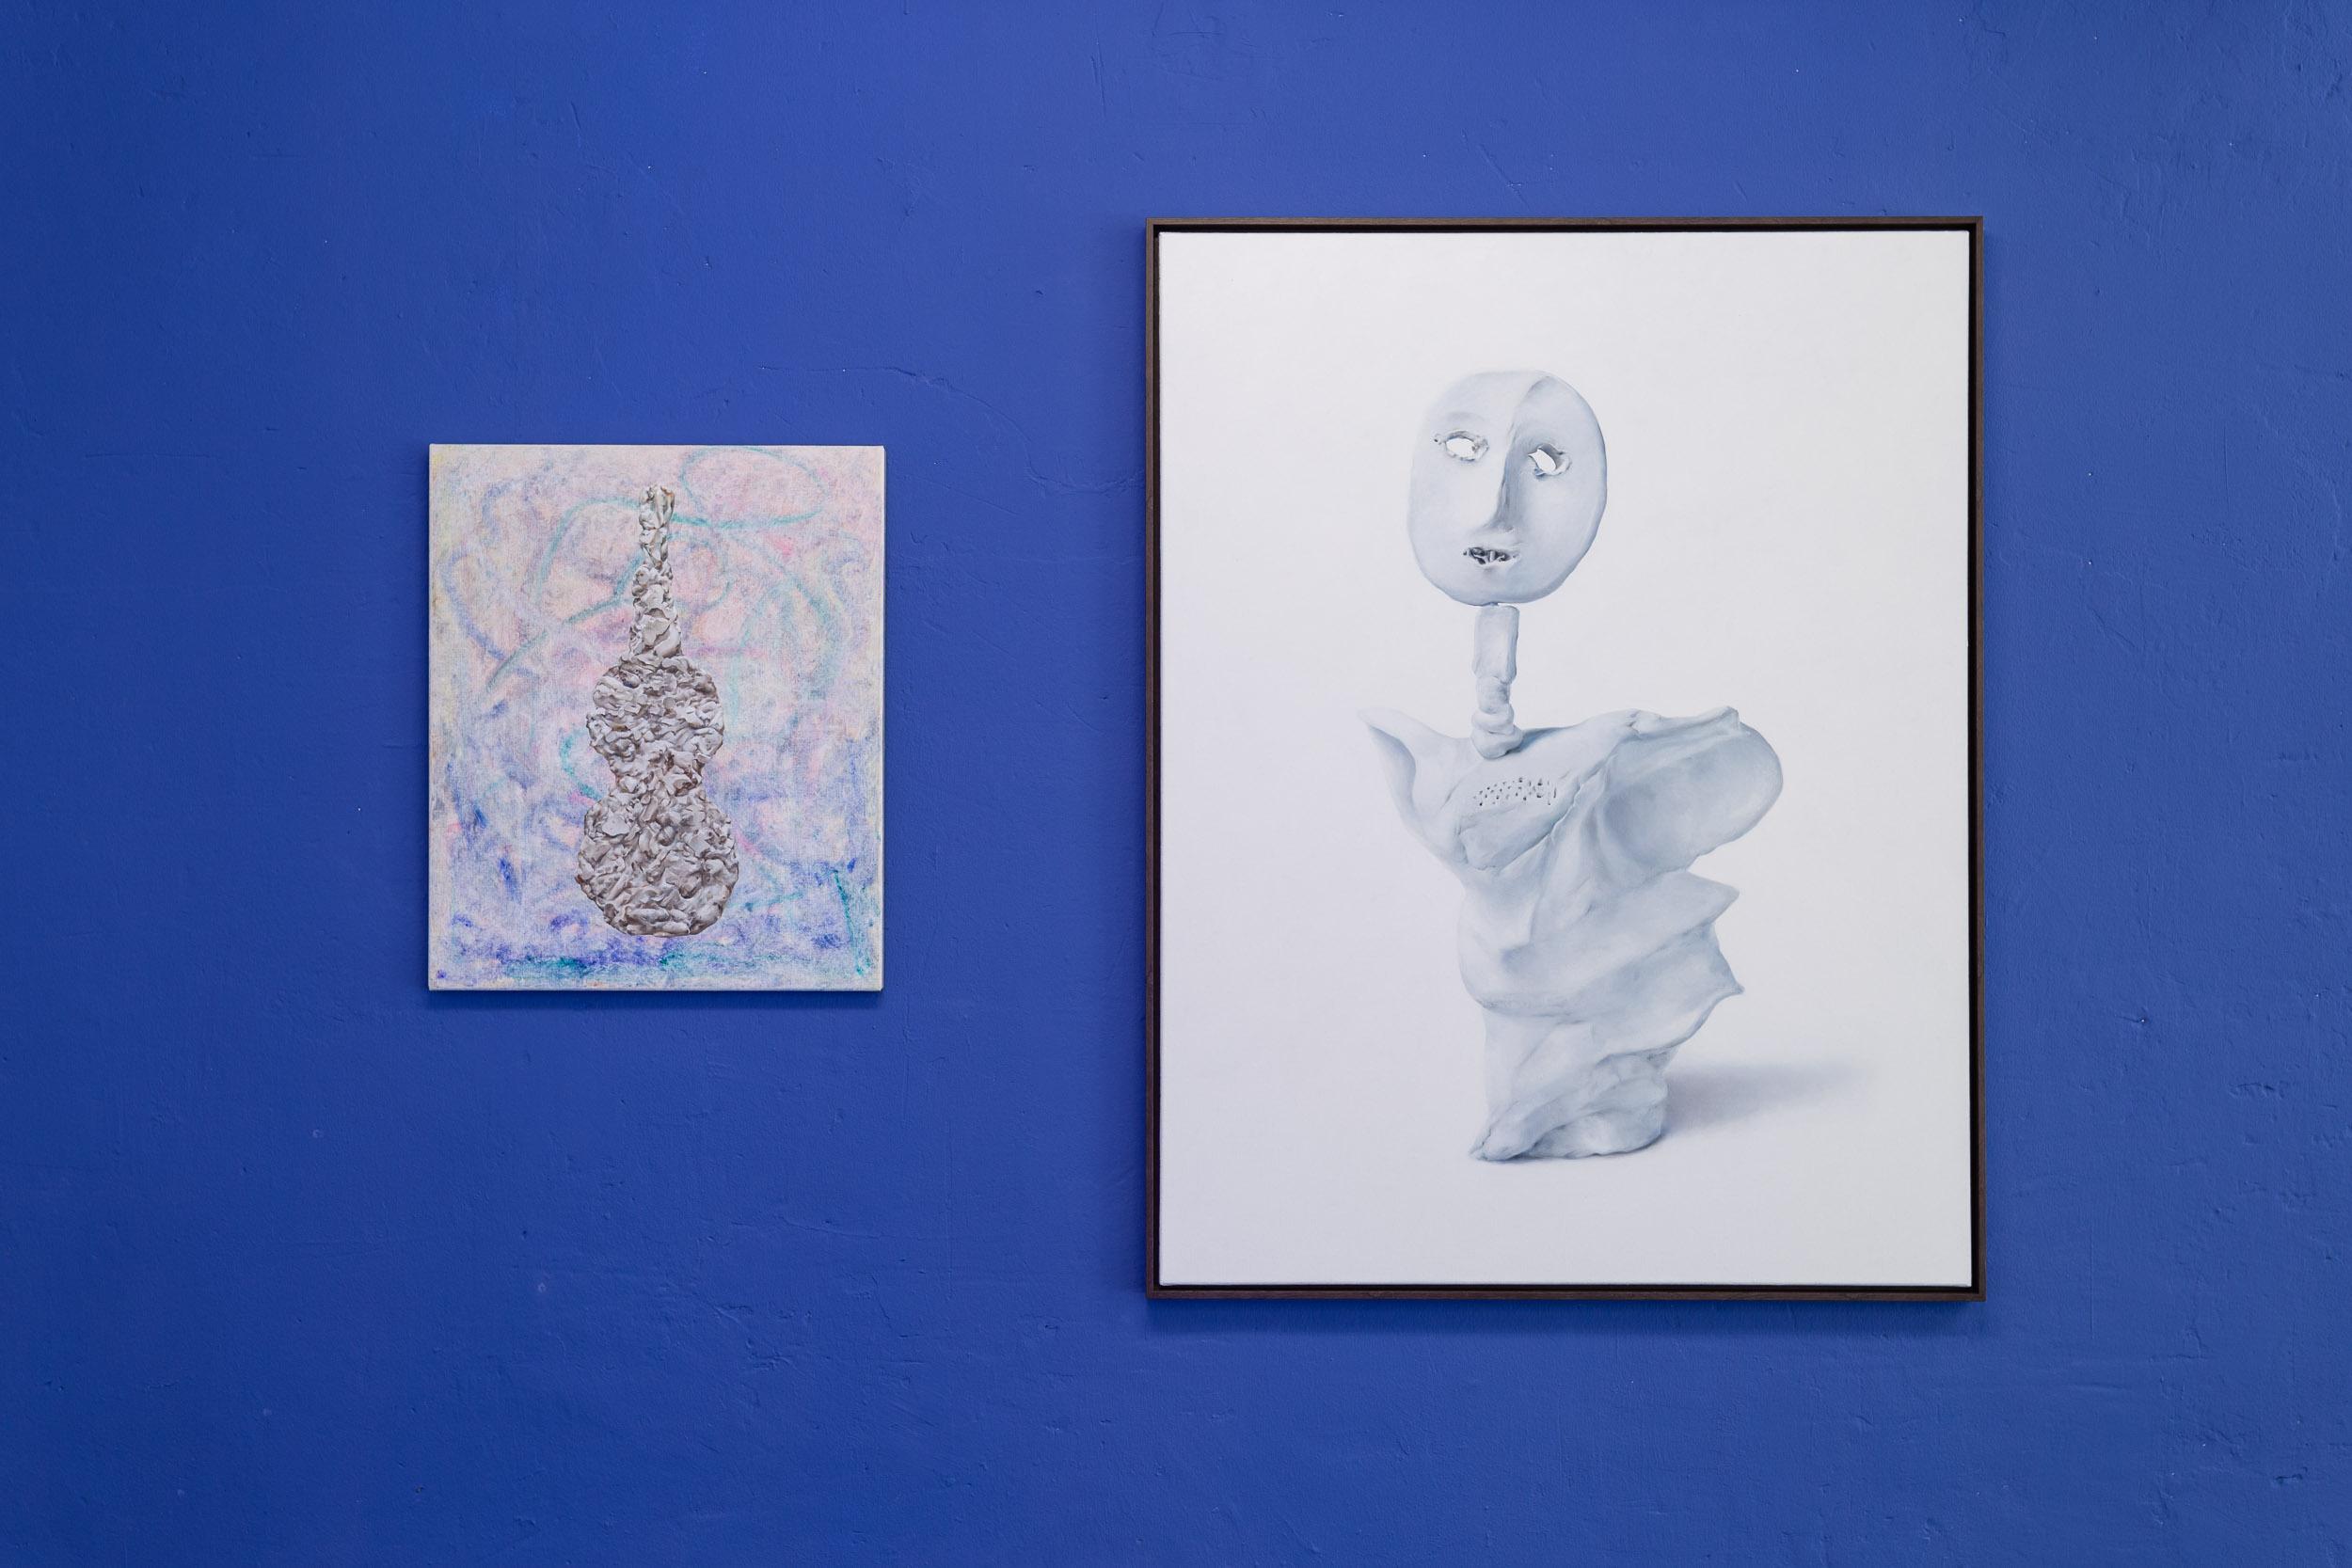 Left: Francisco Sierra,  Violino classic alle mandorle , 2016, oil on canvas, 60 x 50 cm  Right: Francisco Sierra,  Ålmos , 2016, oil on canvas  Photo: Kilian Bannwart